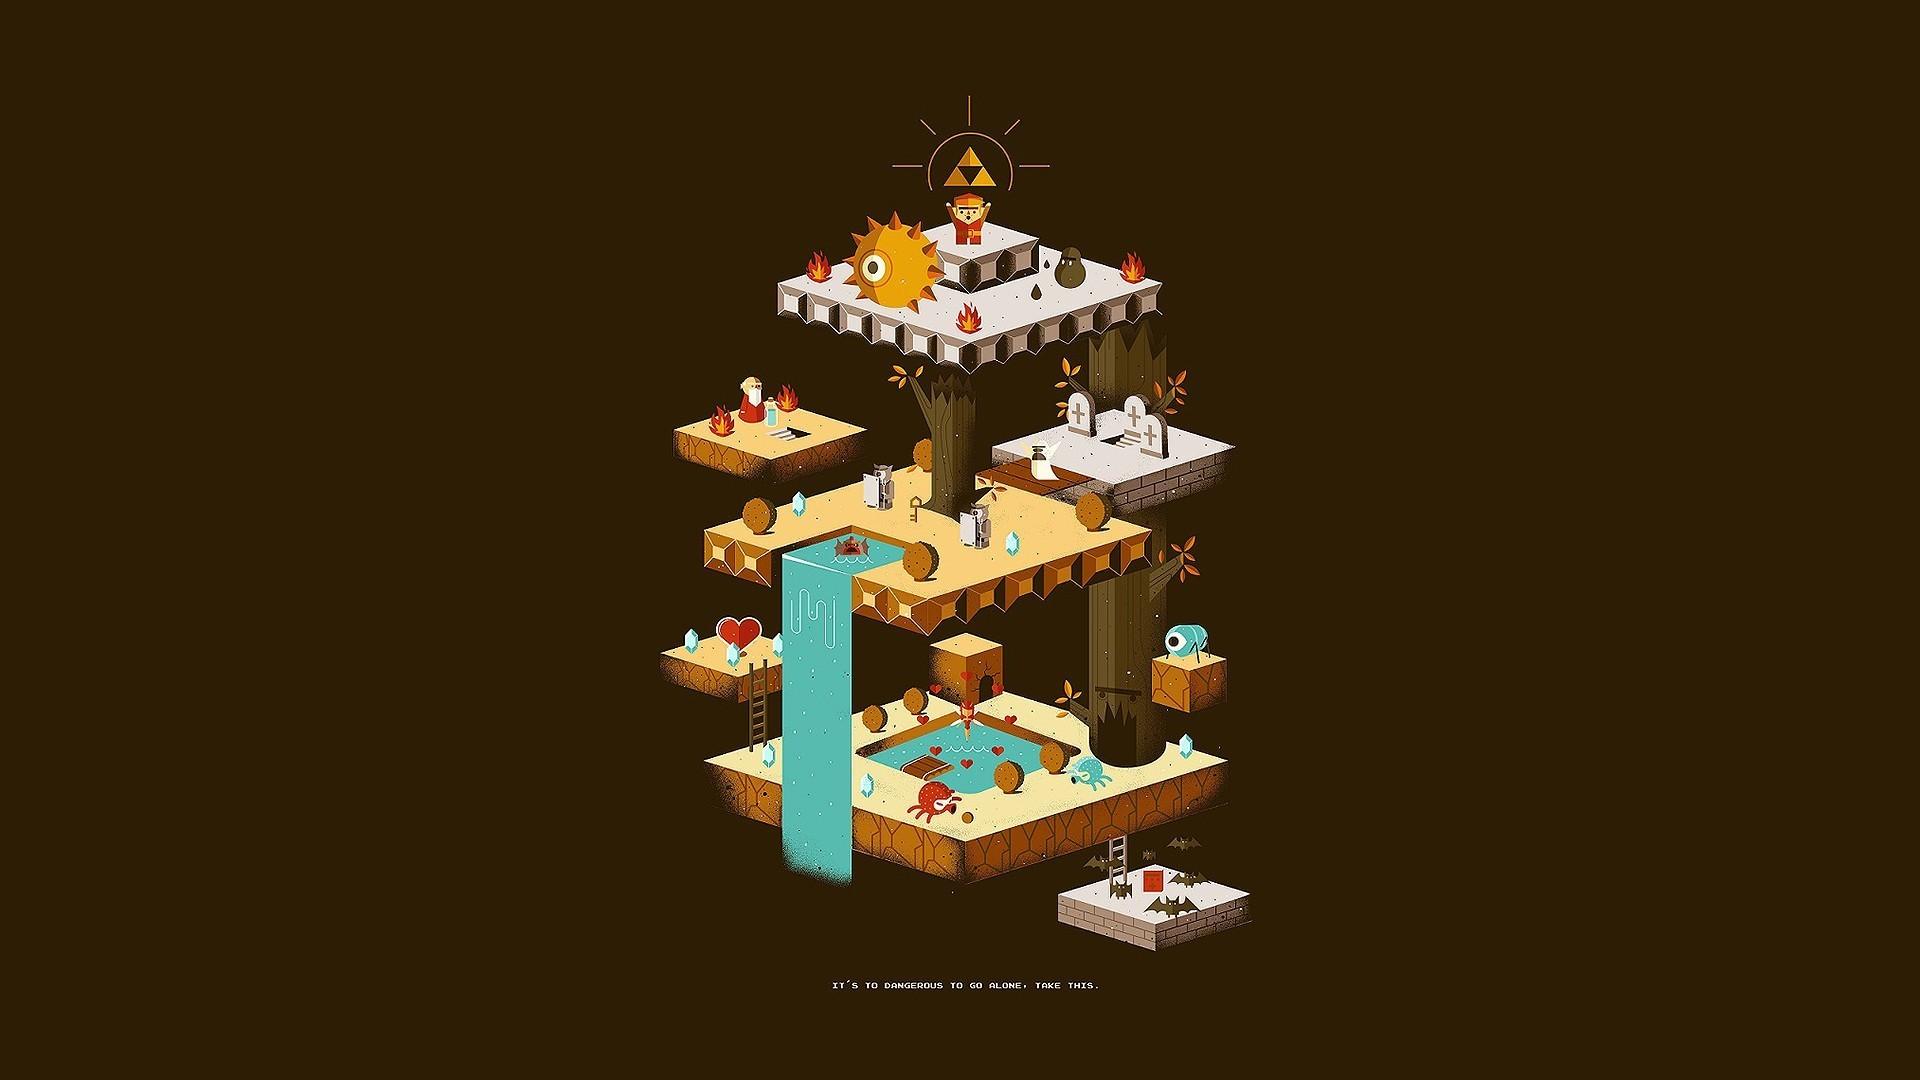 General isometric The Legend of Zelda Triforce rupee